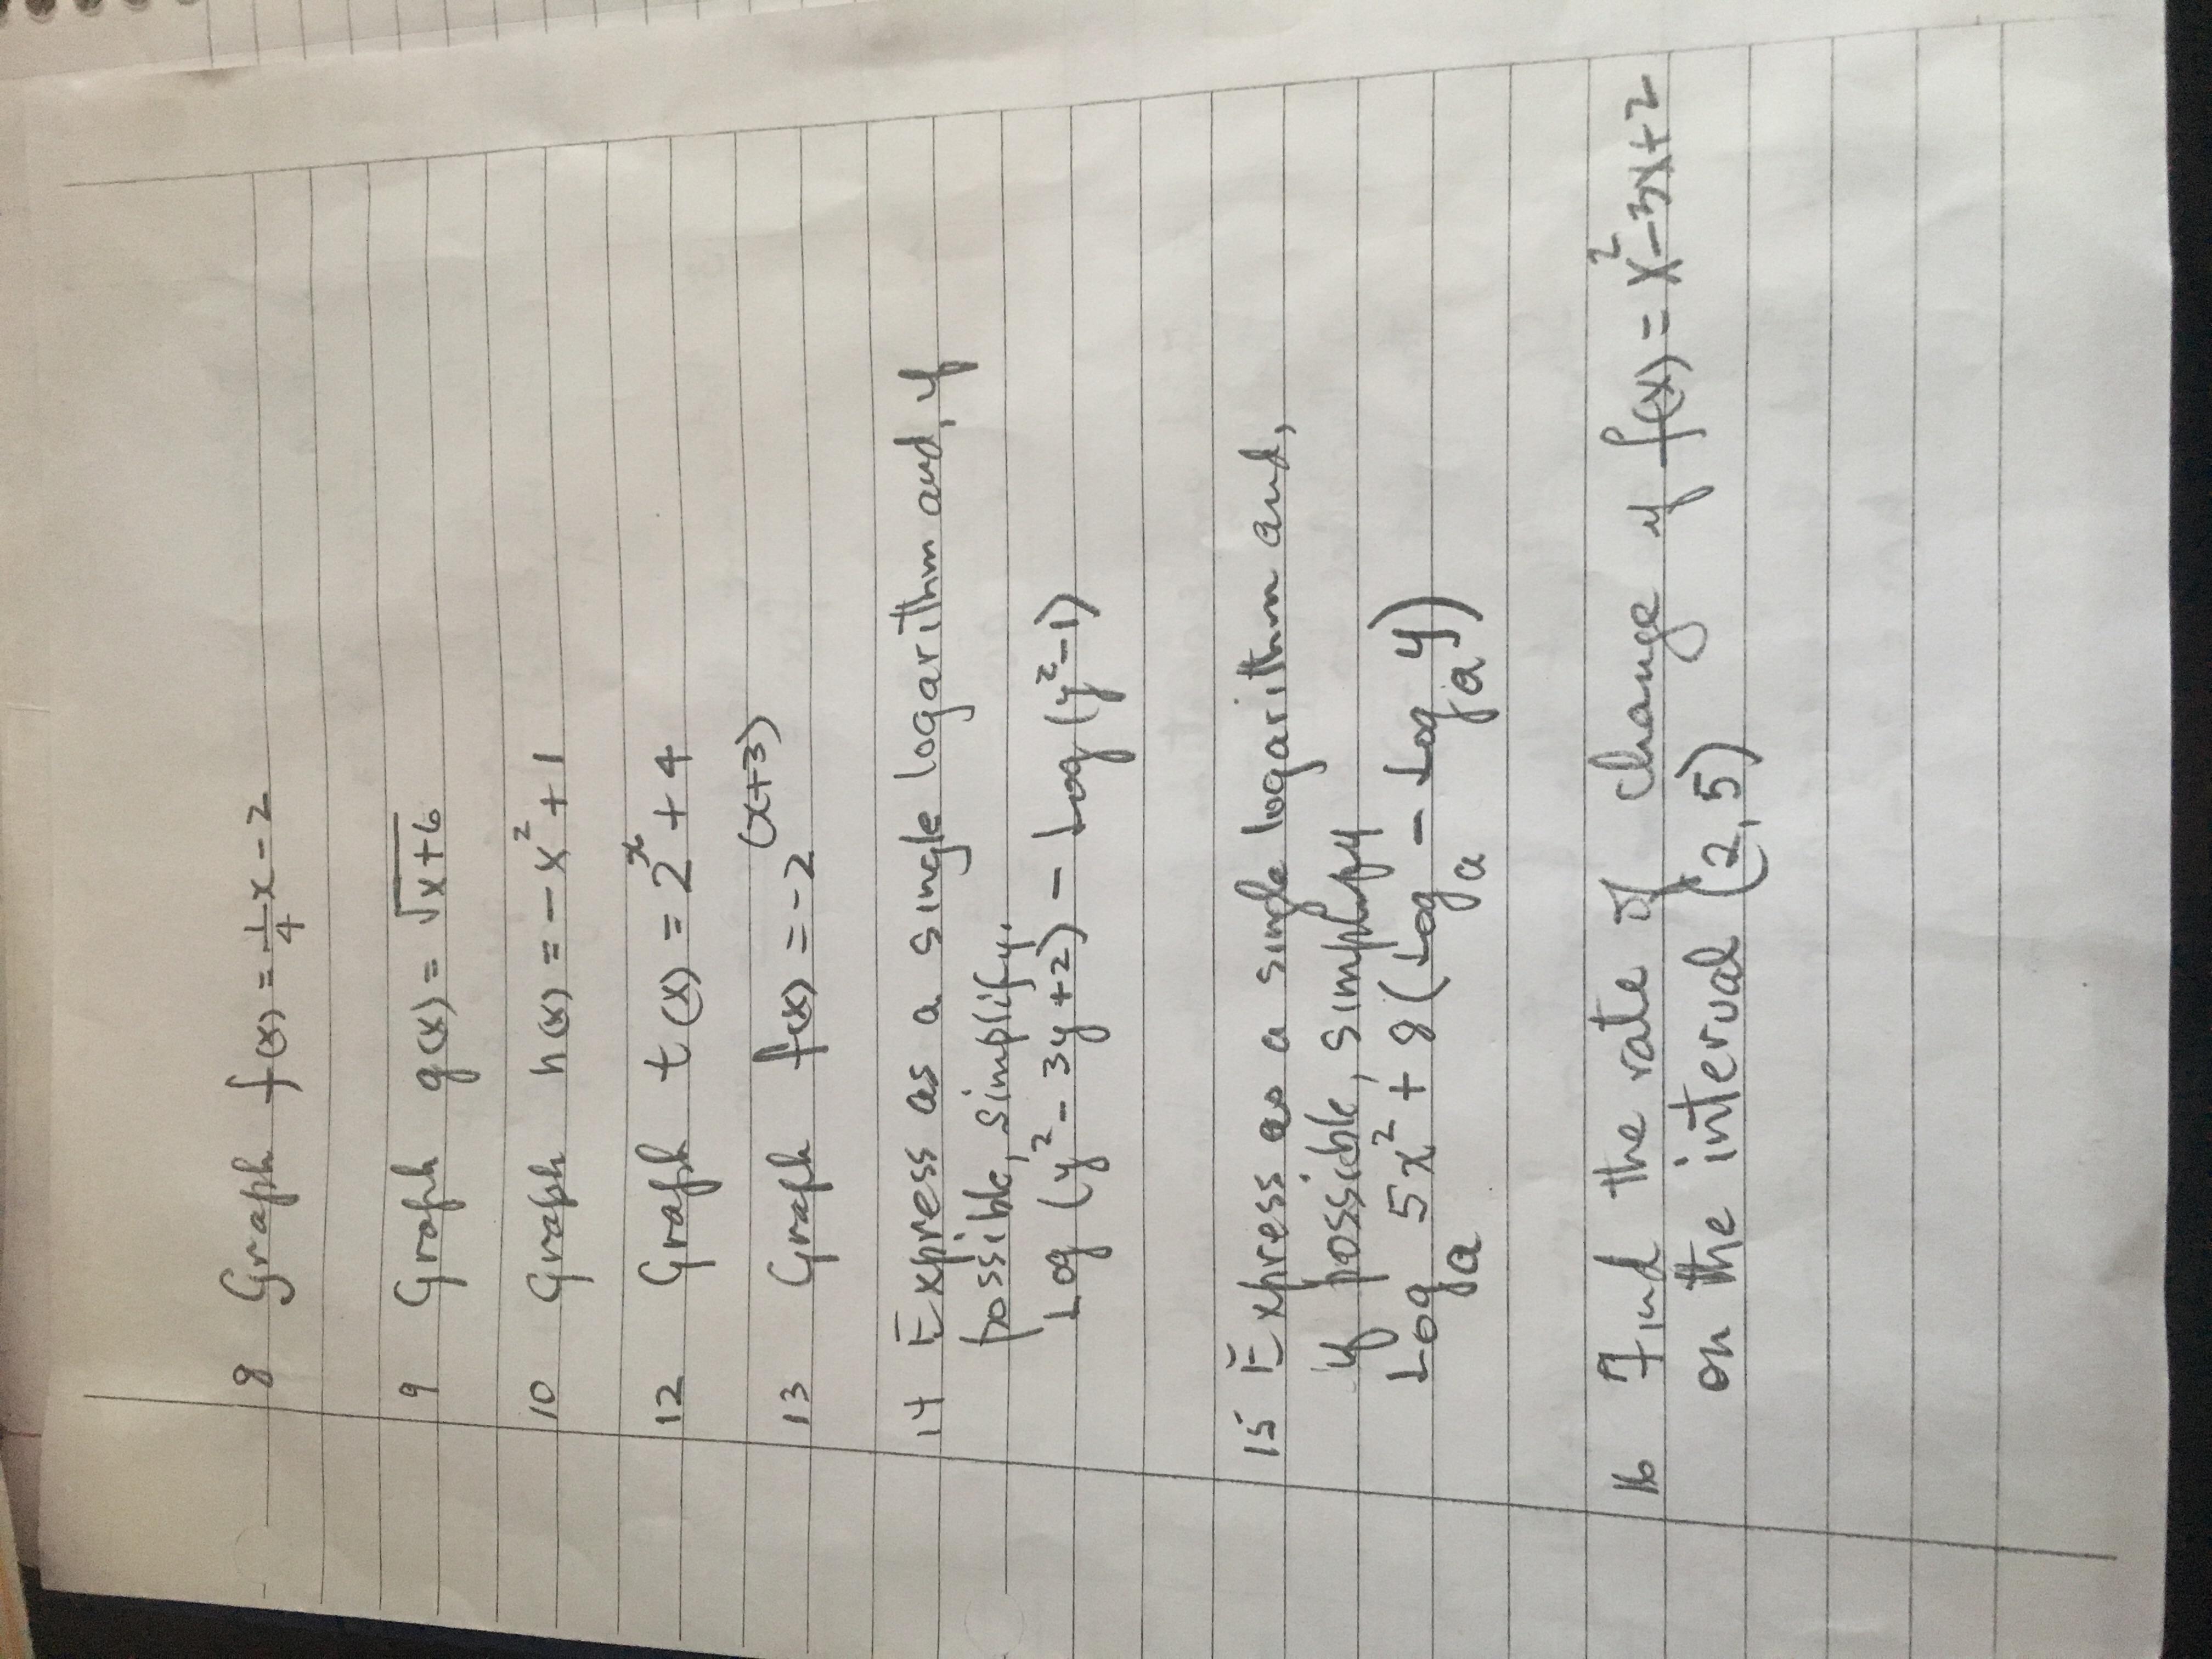 Seaph fer-+x-2 4 १ १४) = \xr6 Greph ha-x rafh tcy- 2 +4 12 { =-৭) 13 Sngle logarihm aud, t txpress as a 2 - 3१ +) - 1 ग अ 1S Ehress ae a hossible, Sumpl ossible S garn and 5x9(loL) 2P la ak the rate 0n the interual e hange fes-n -X-tT